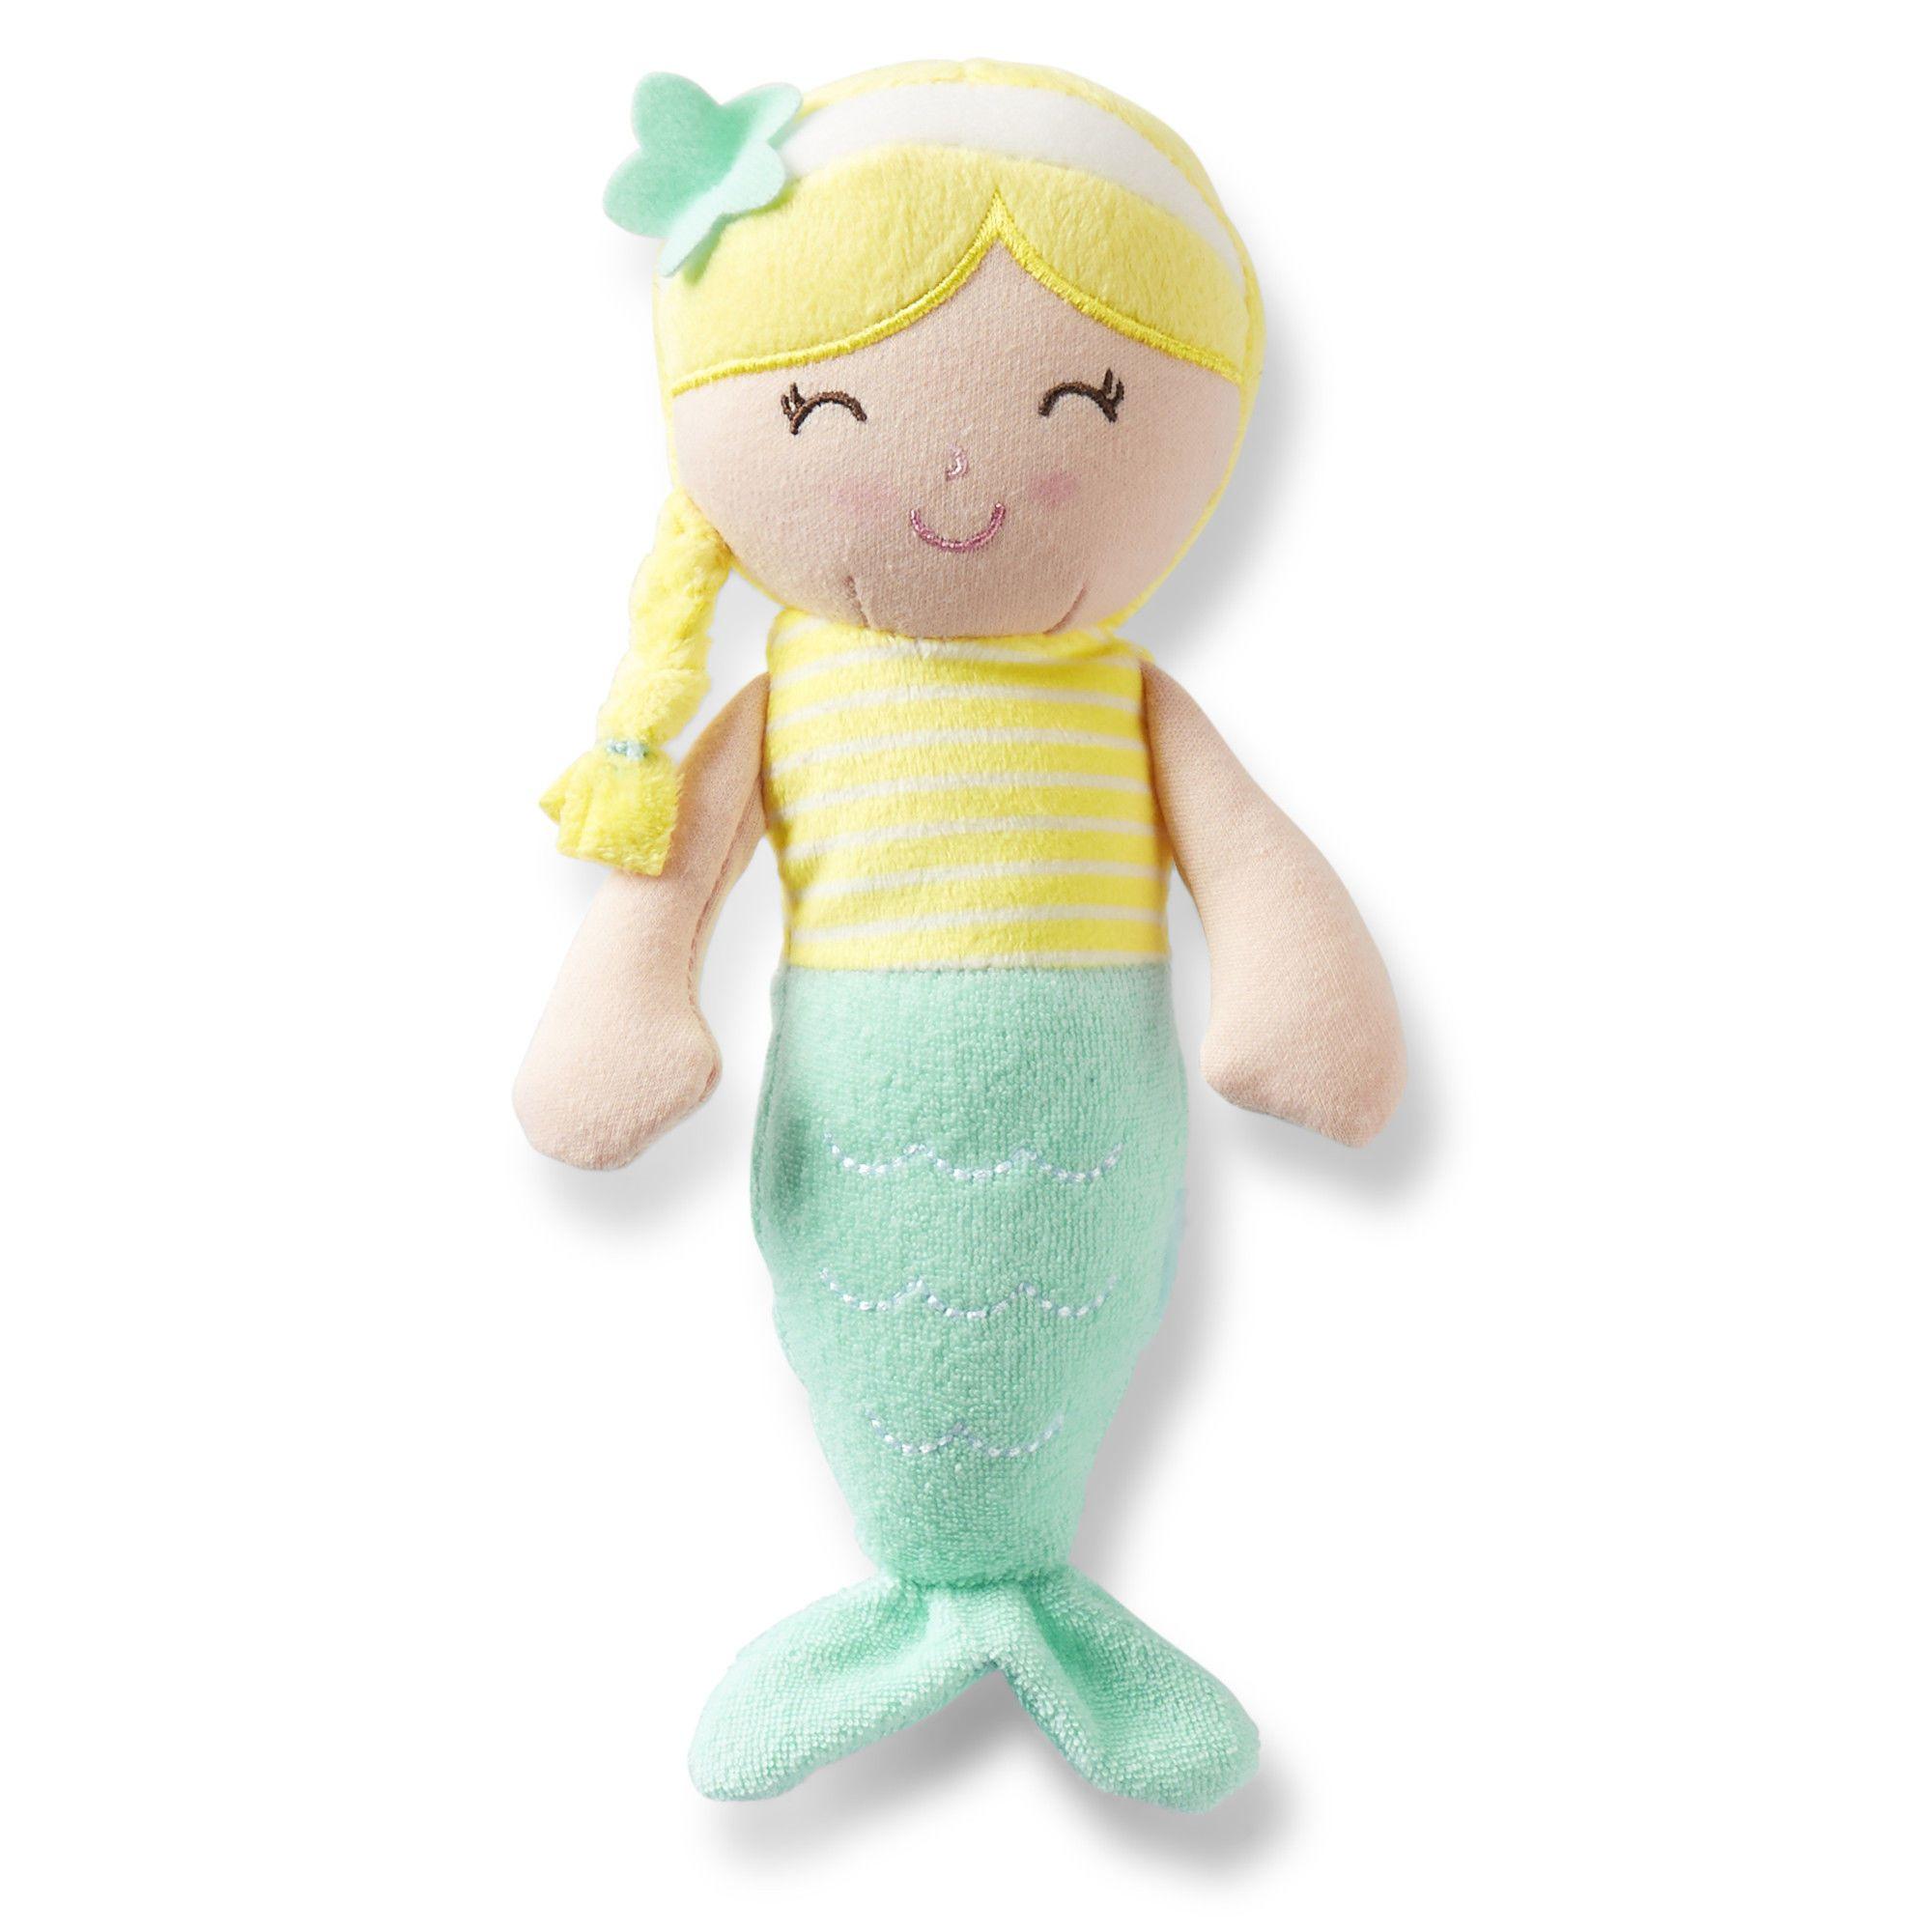 Mermaid Doll | Carter's CUTEST EVER